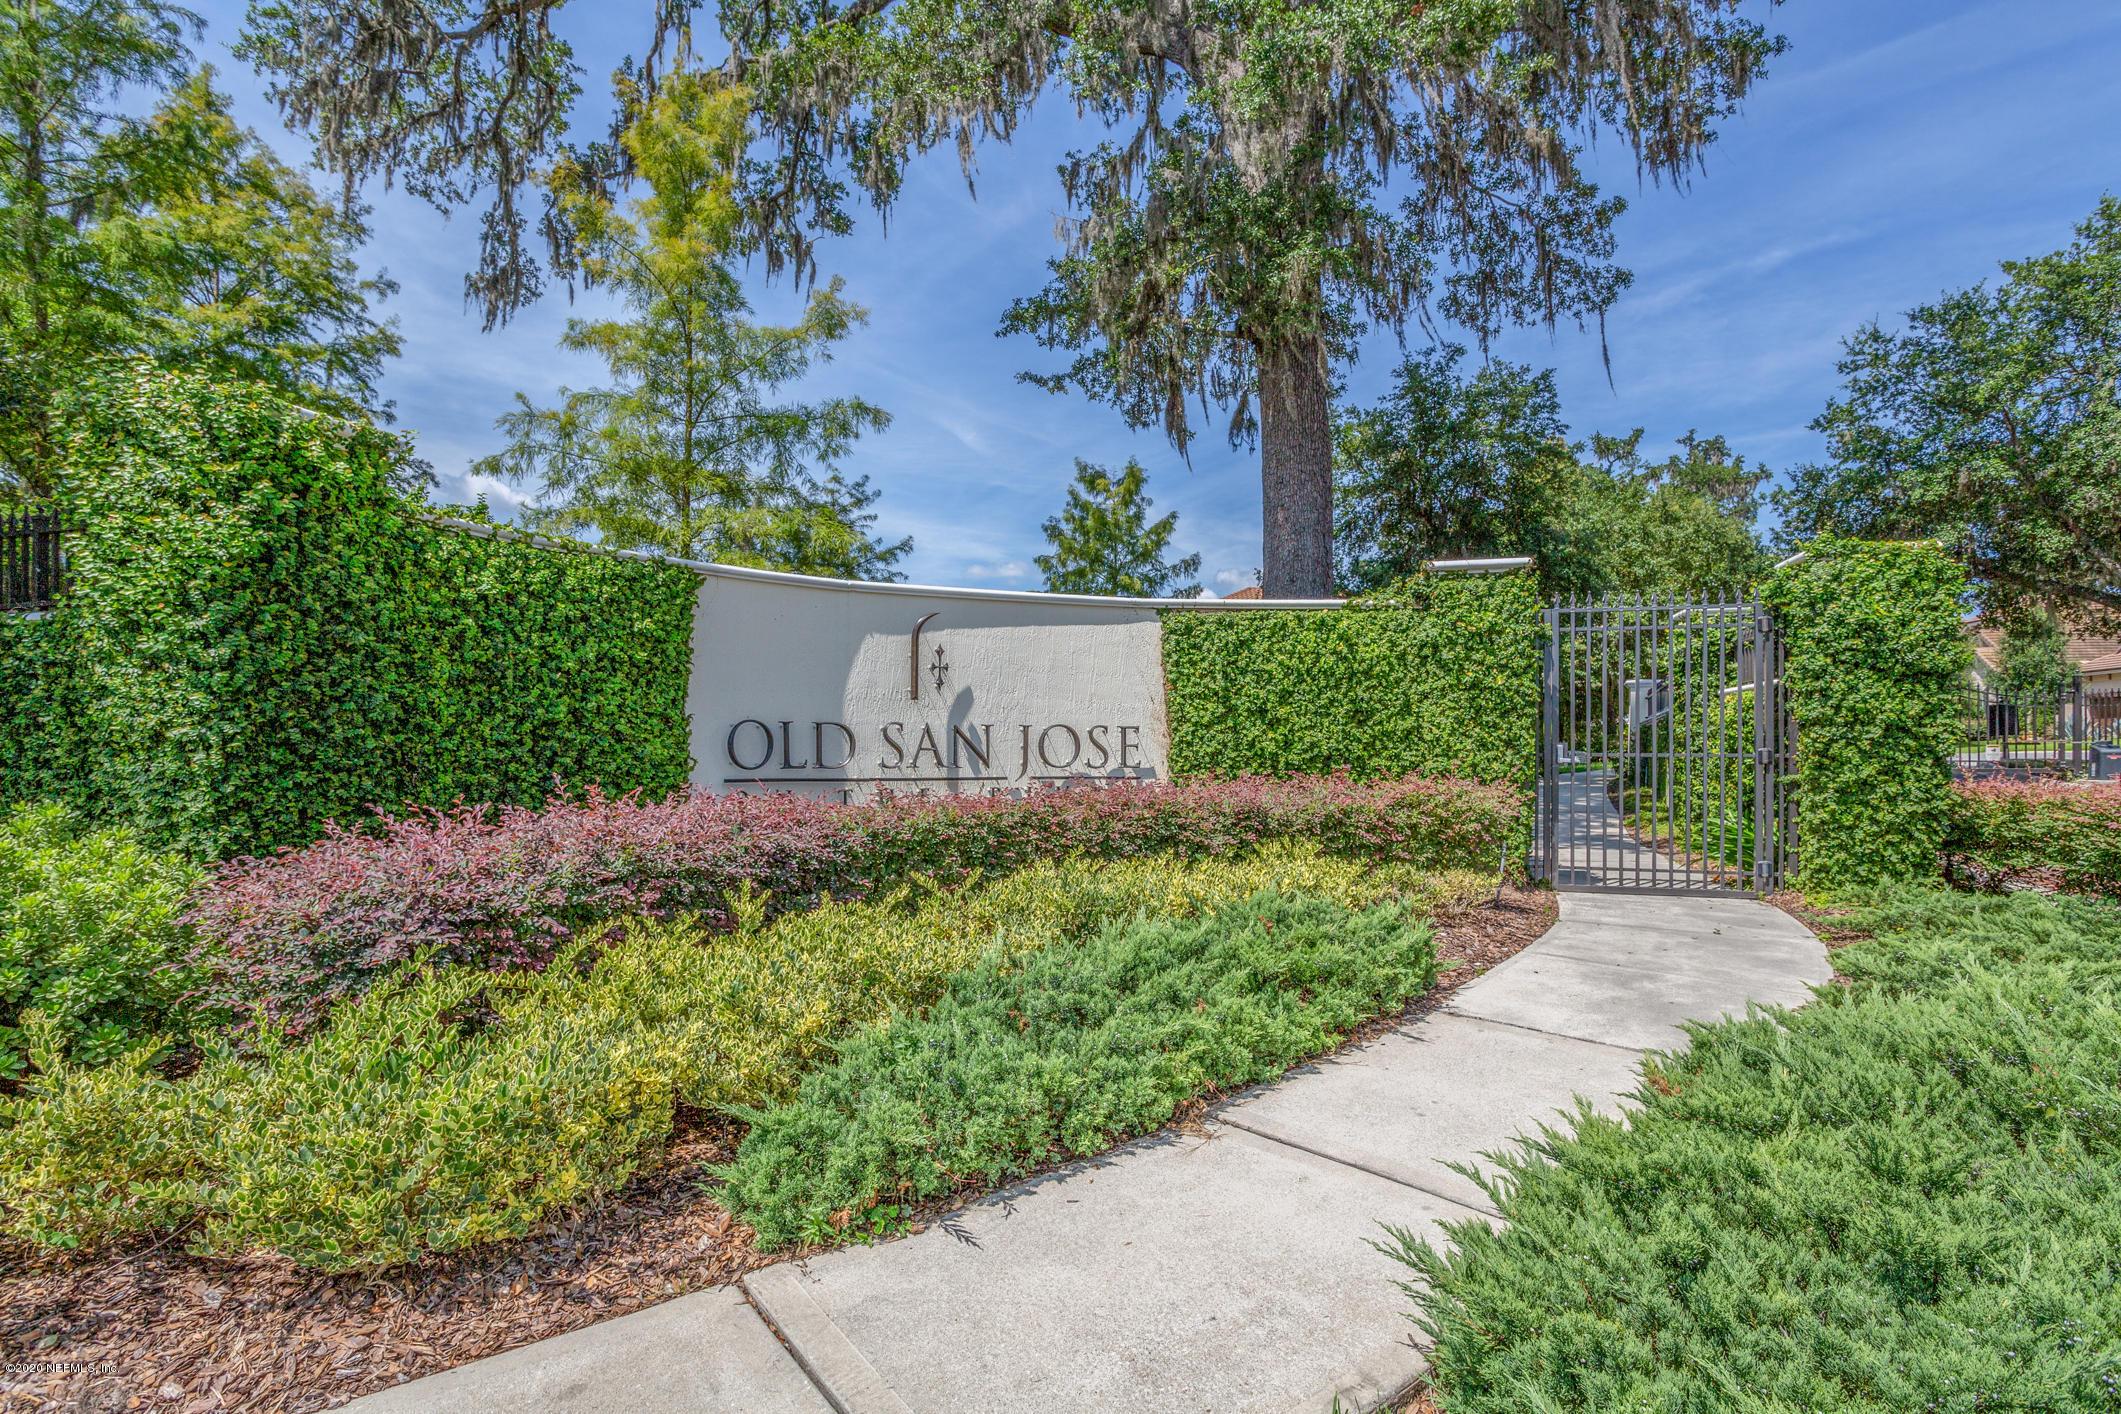 1311 HERITAGE MANOR, JACKSONVILLE, FLORIDA 32207, 3 Bedrooms Bedrooms, ,3 BathroomsBathrooms,Residential,For sale,HERITAGE MANOR,1040497